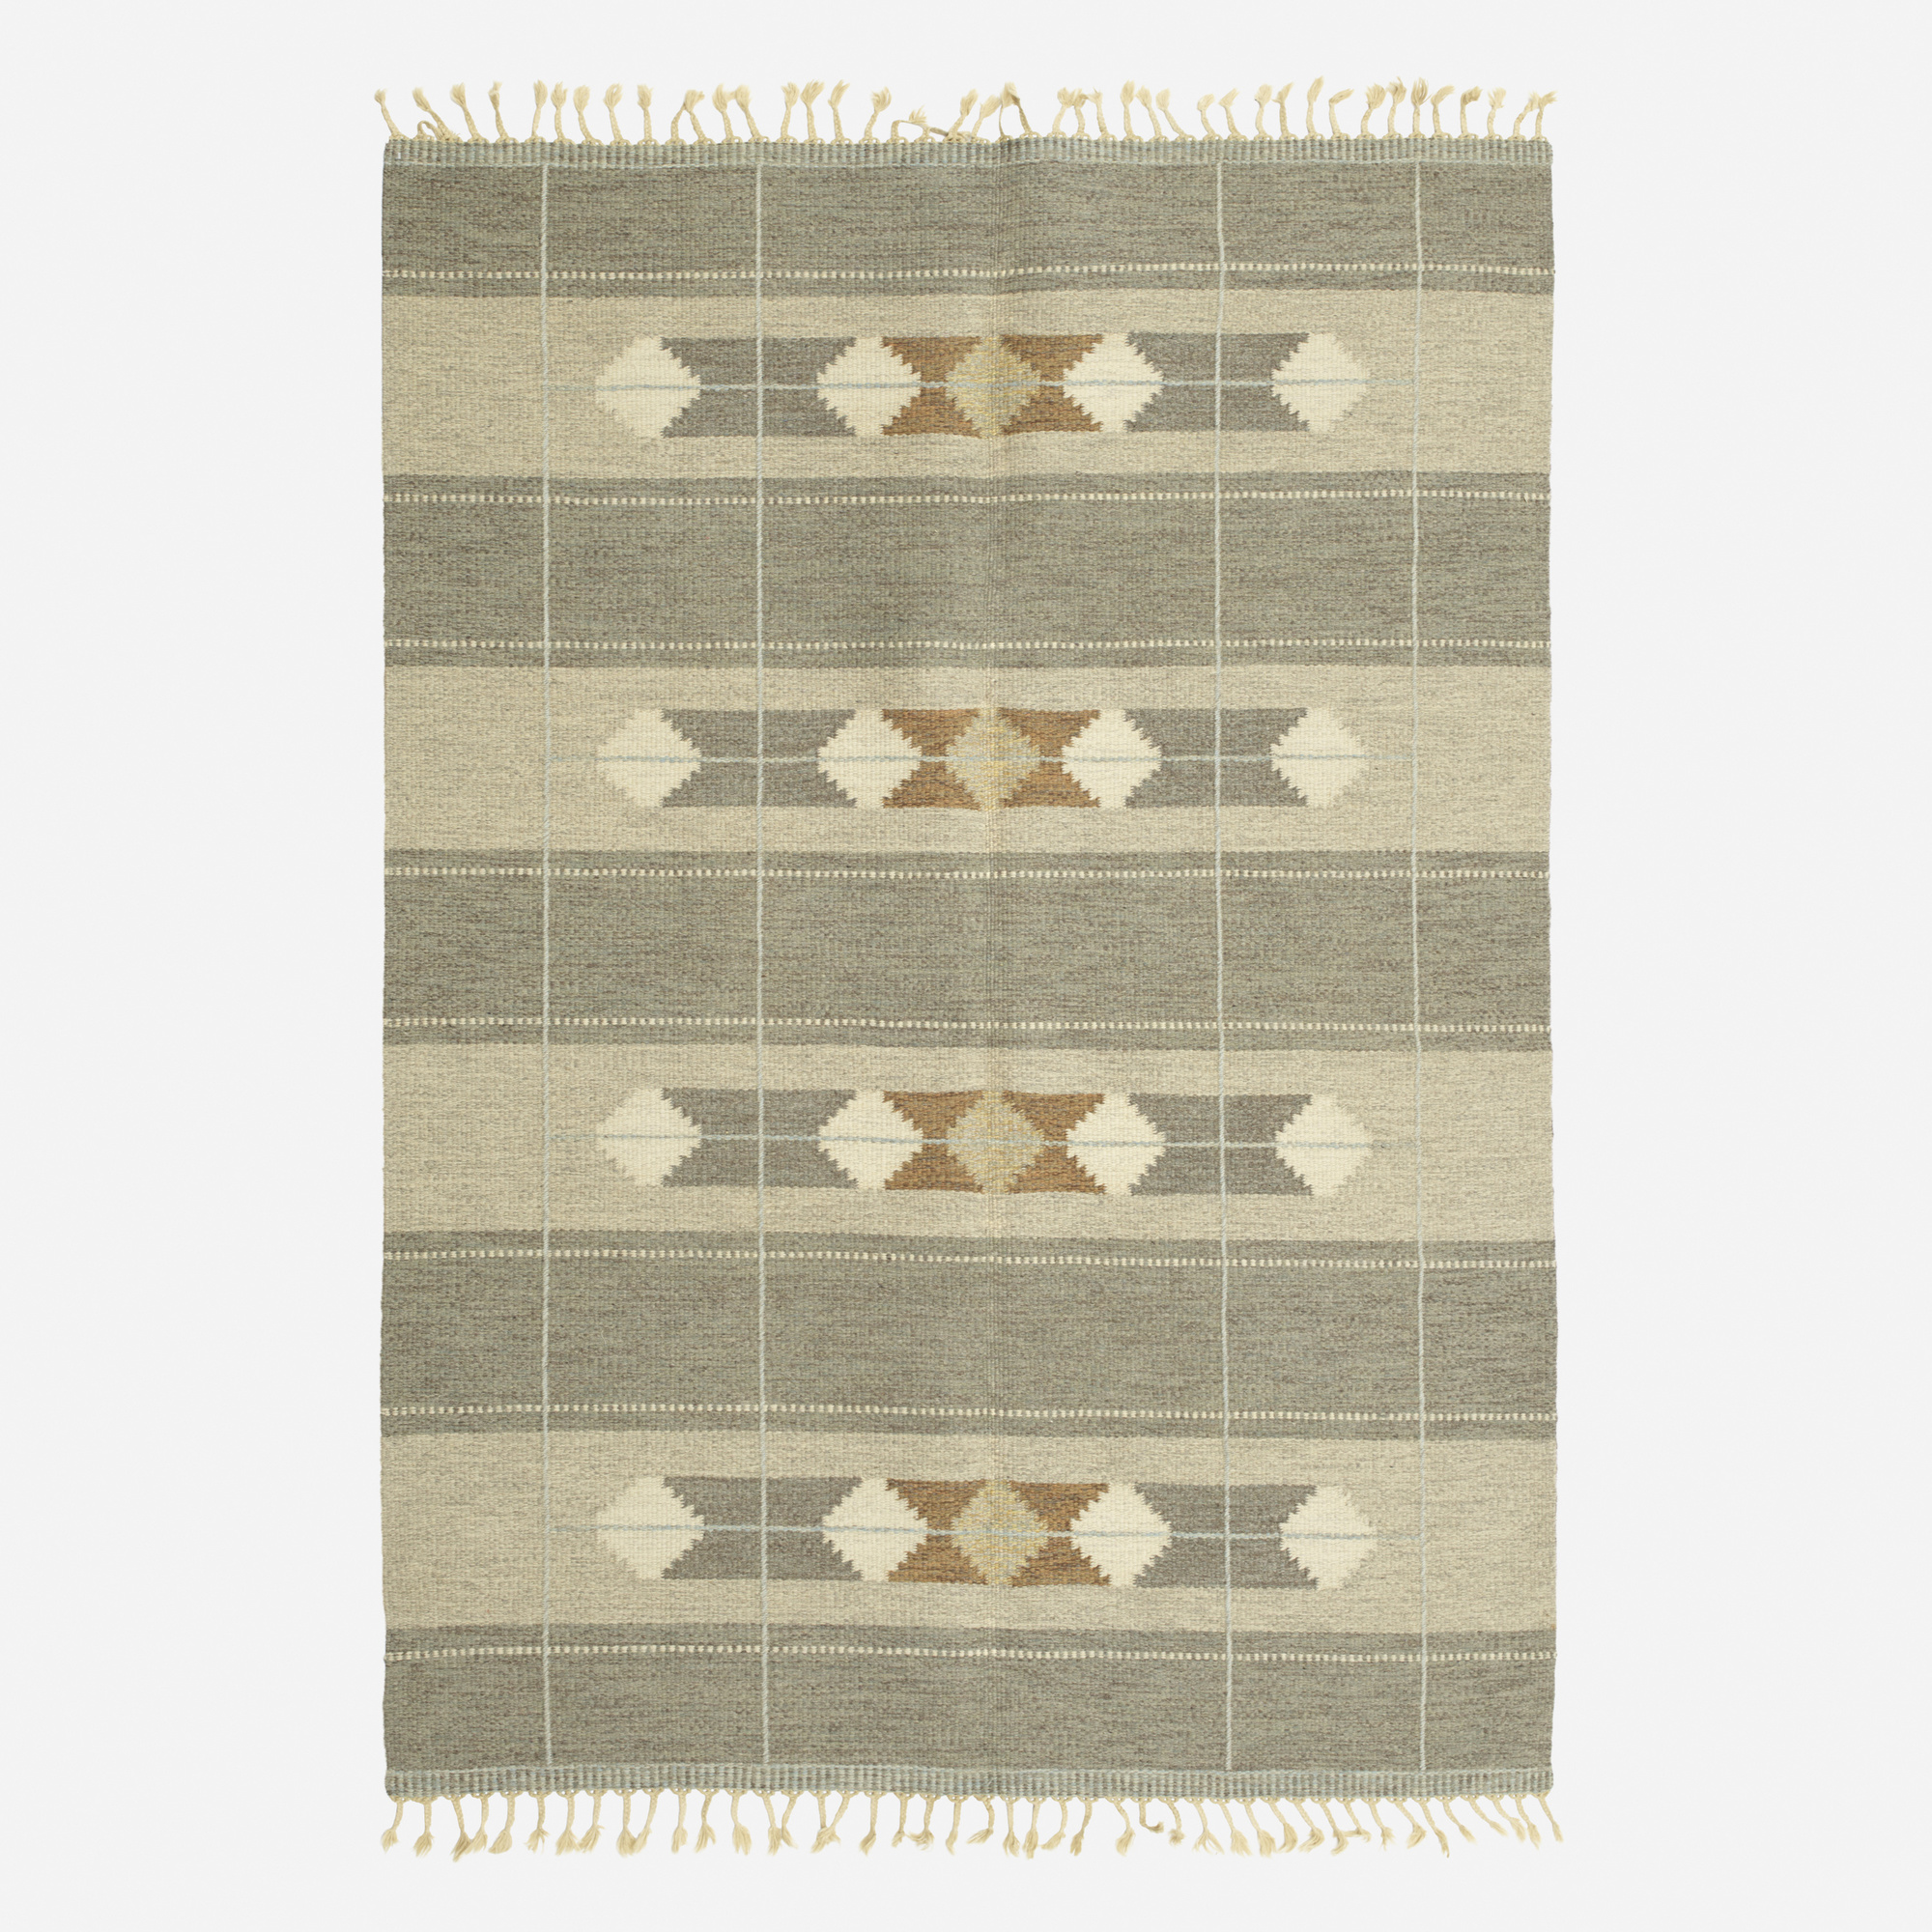 302: Swedish / flatweave carpet (1 of 2)